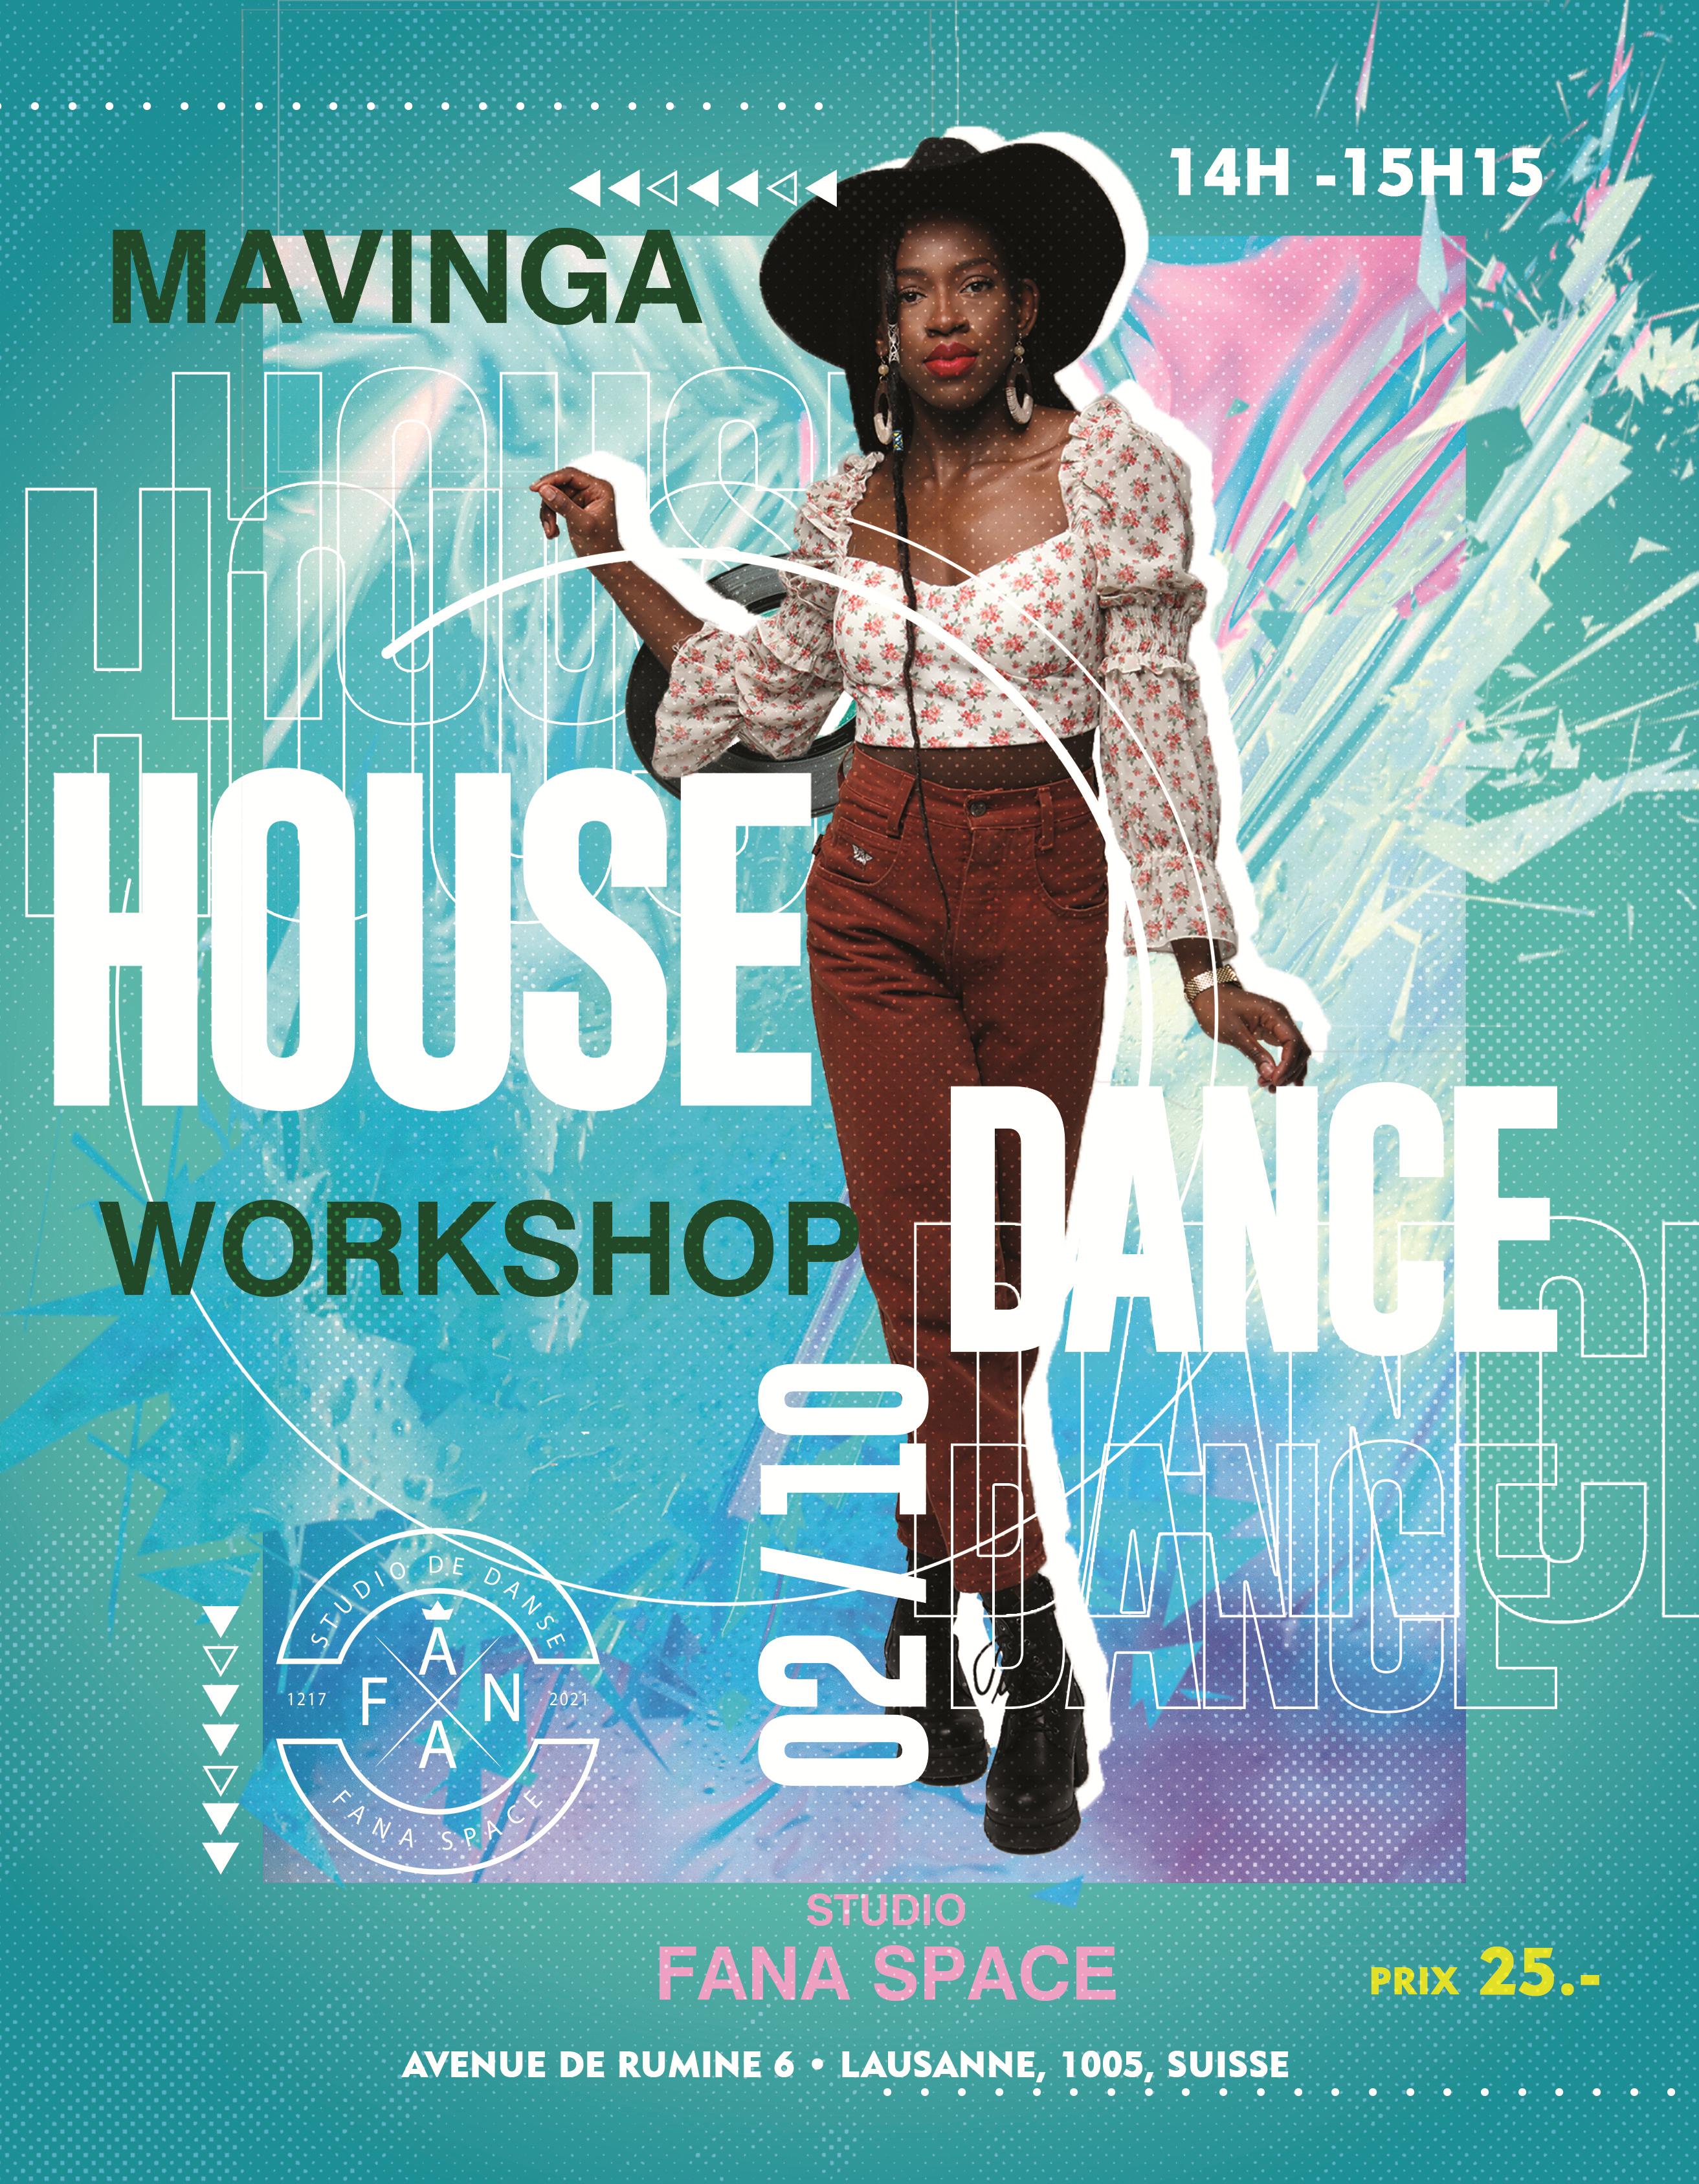 Mavinga House Dance